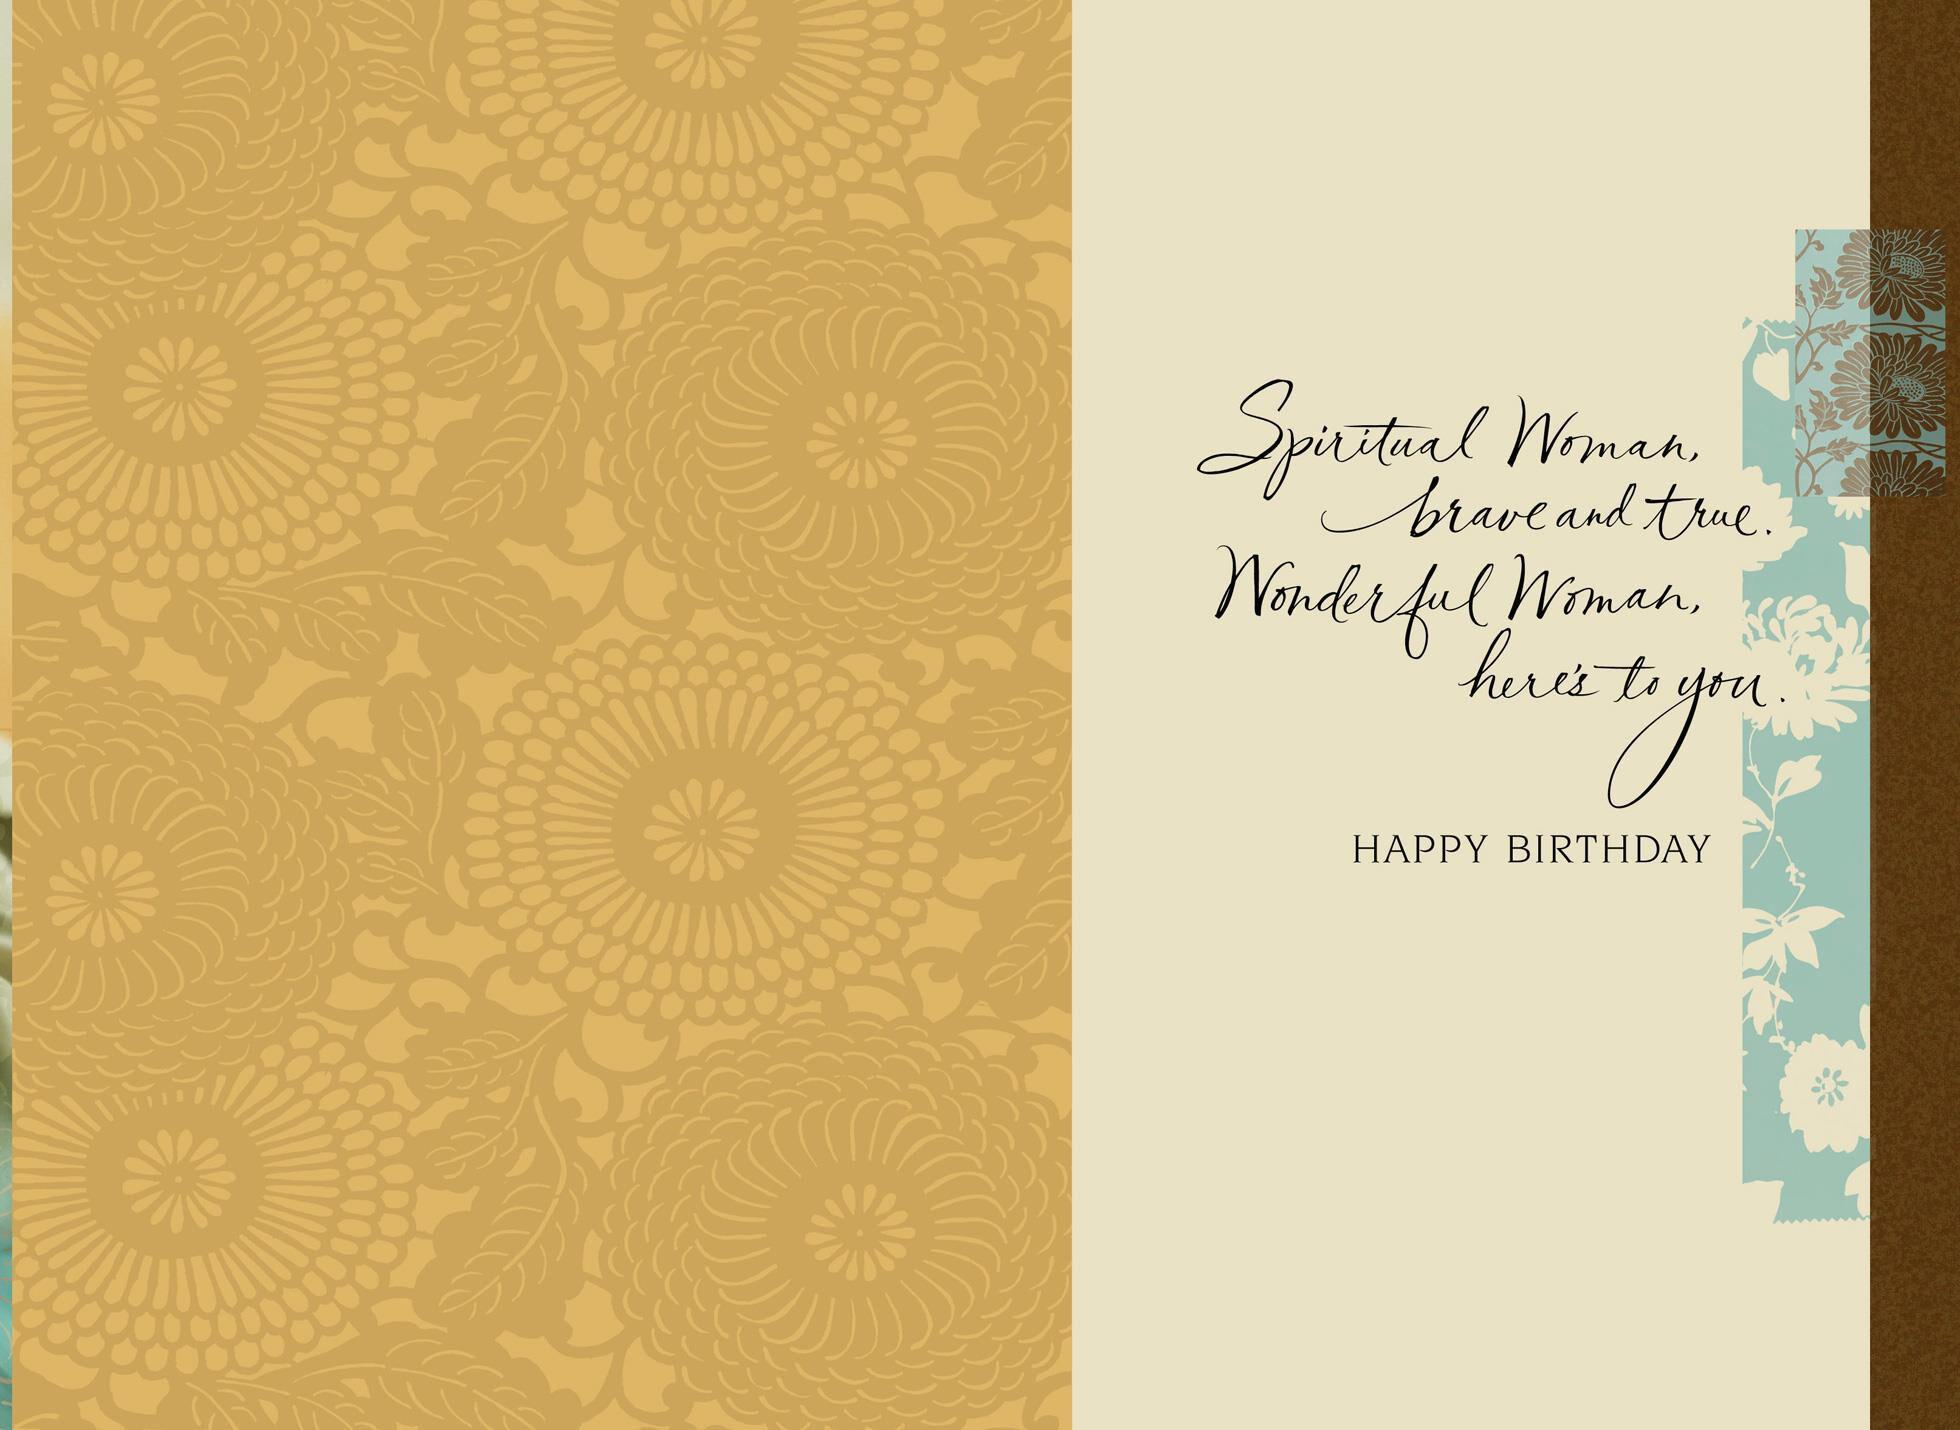 beautiful woman birthday card  greeting cards  hallmark